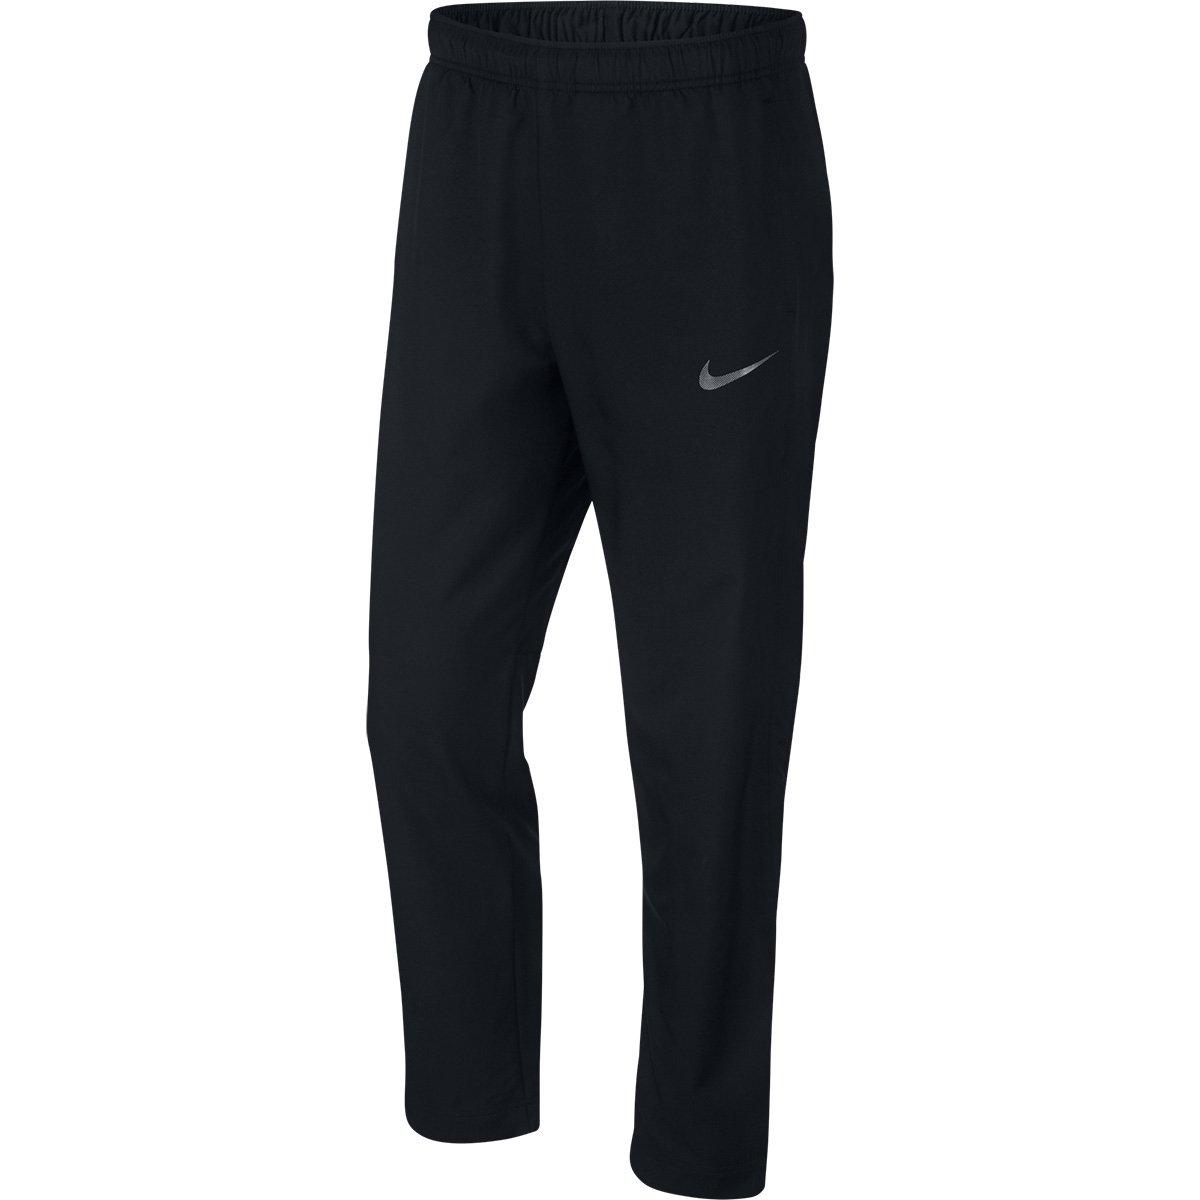 Calça Nike Dry Team Woven Masculina - Preto e Cinza - Compre Agora ... 7f99d787dd9ec